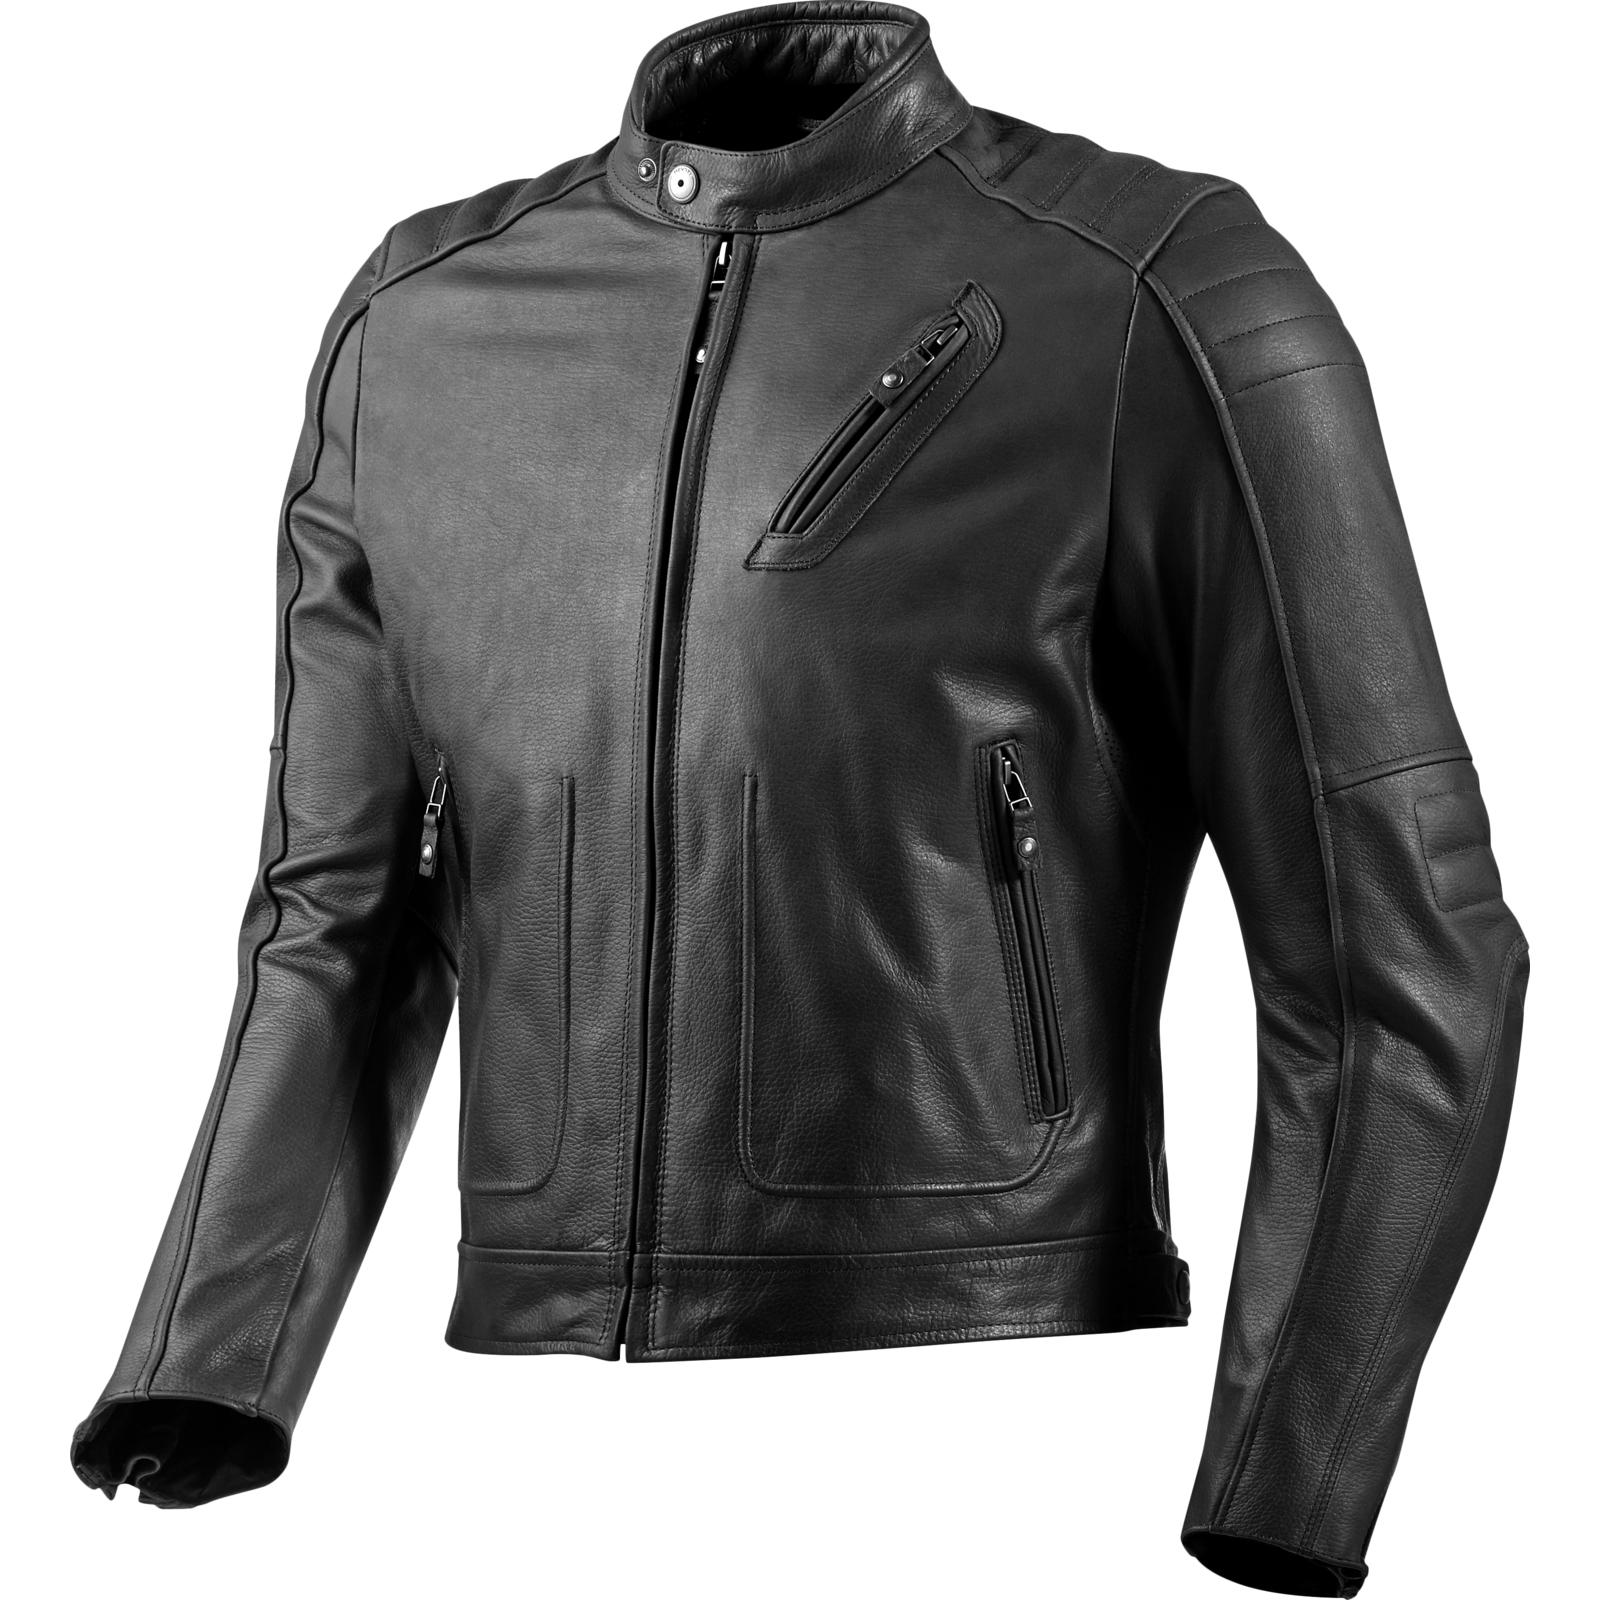 rev it redhook classic motorcycle cowhide leather vintage